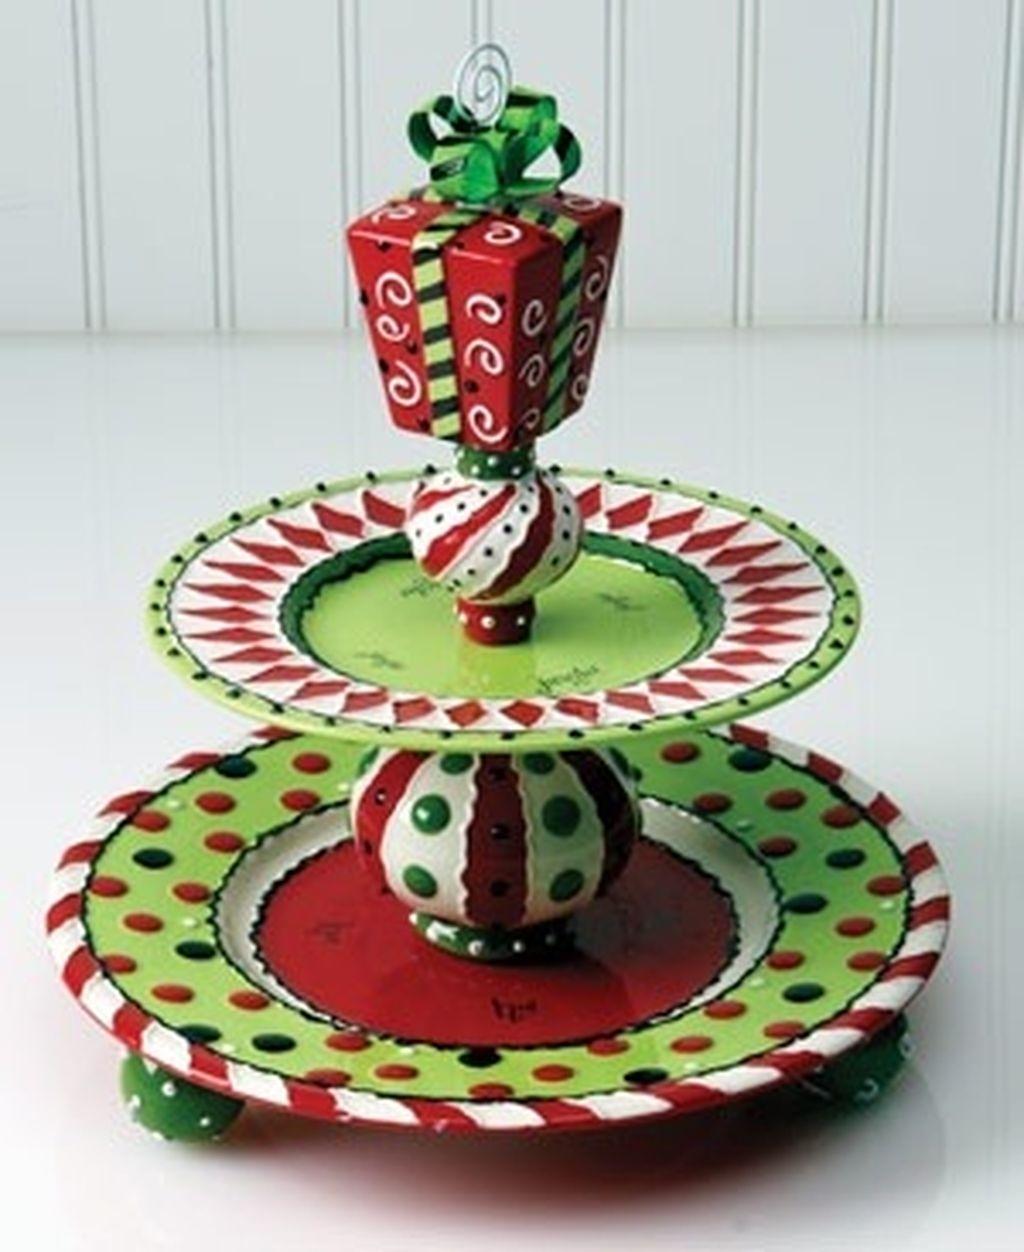 Decorative cake plates & Decorative Cake Plates - Foter